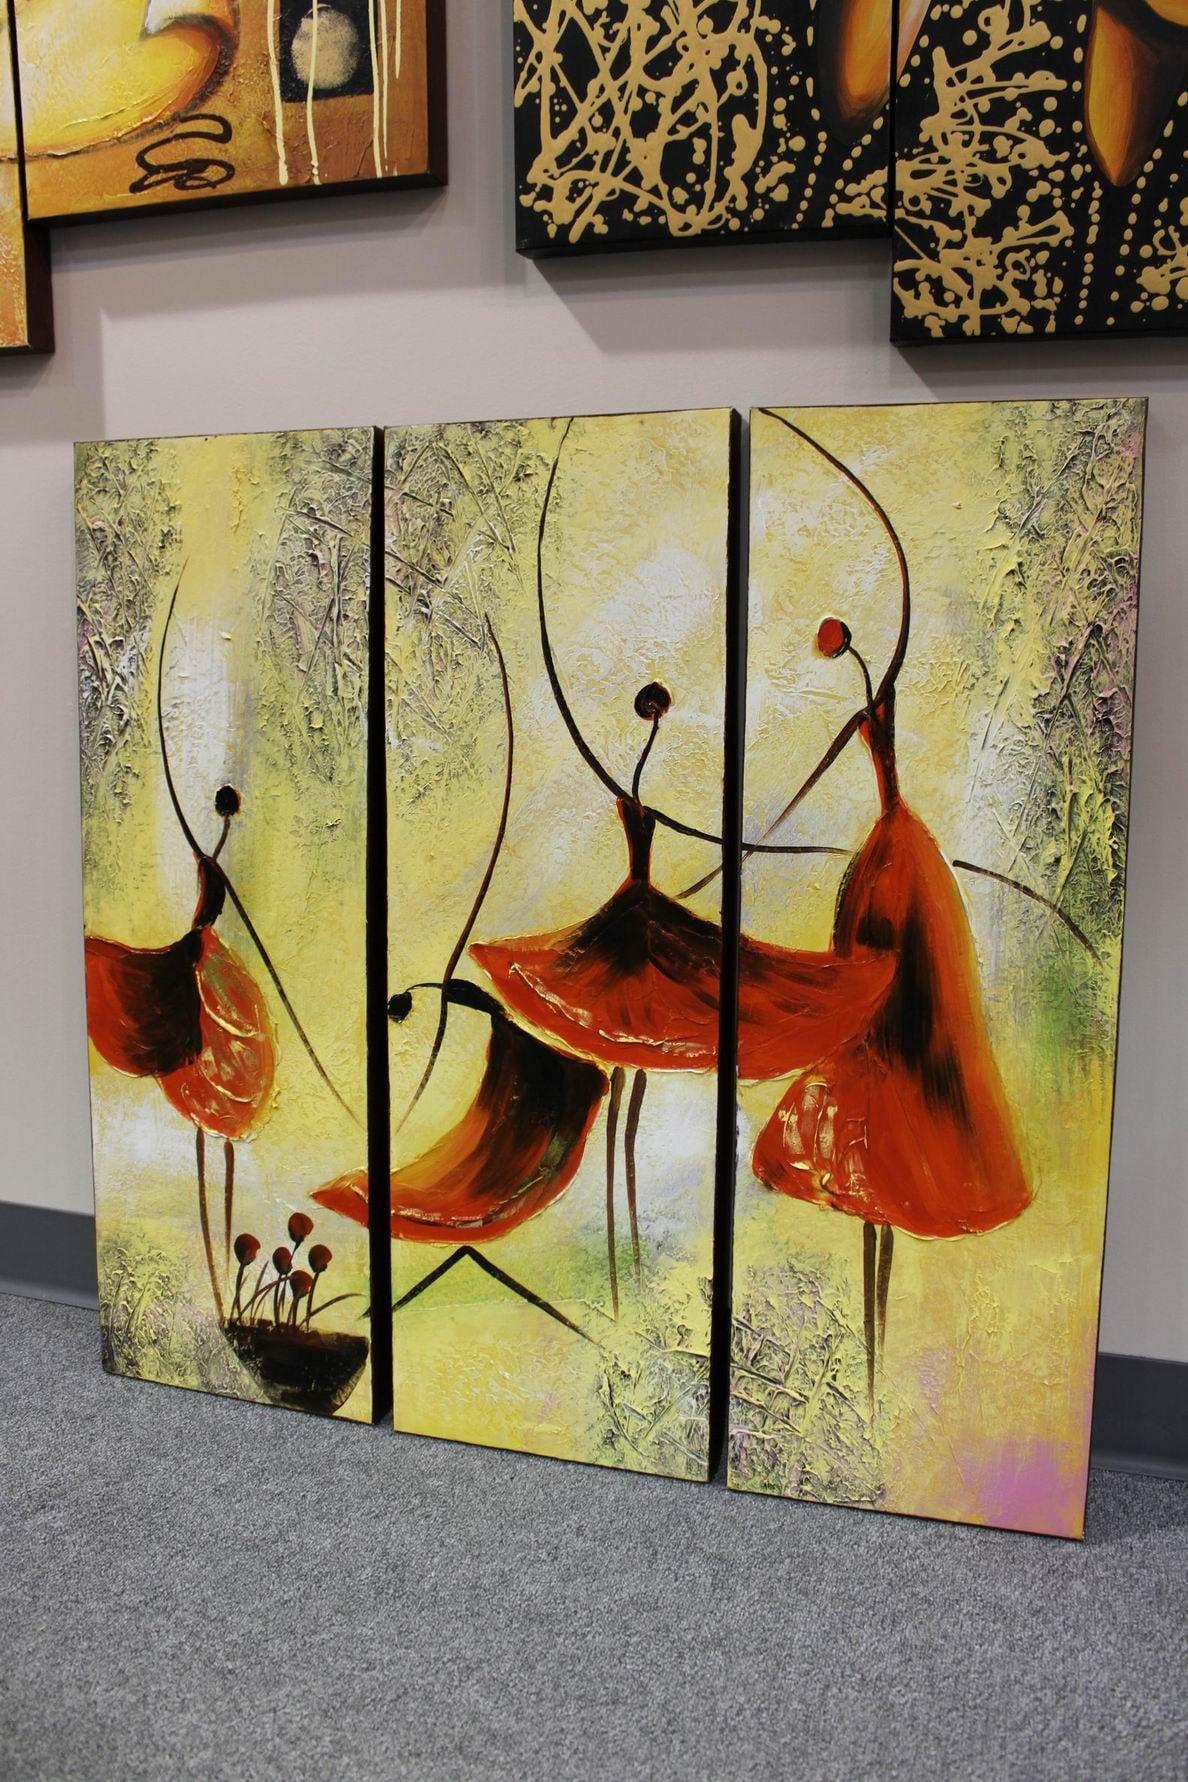 Red Ballerina Ballet Acrylic Painting Yellow Wall Art Decor